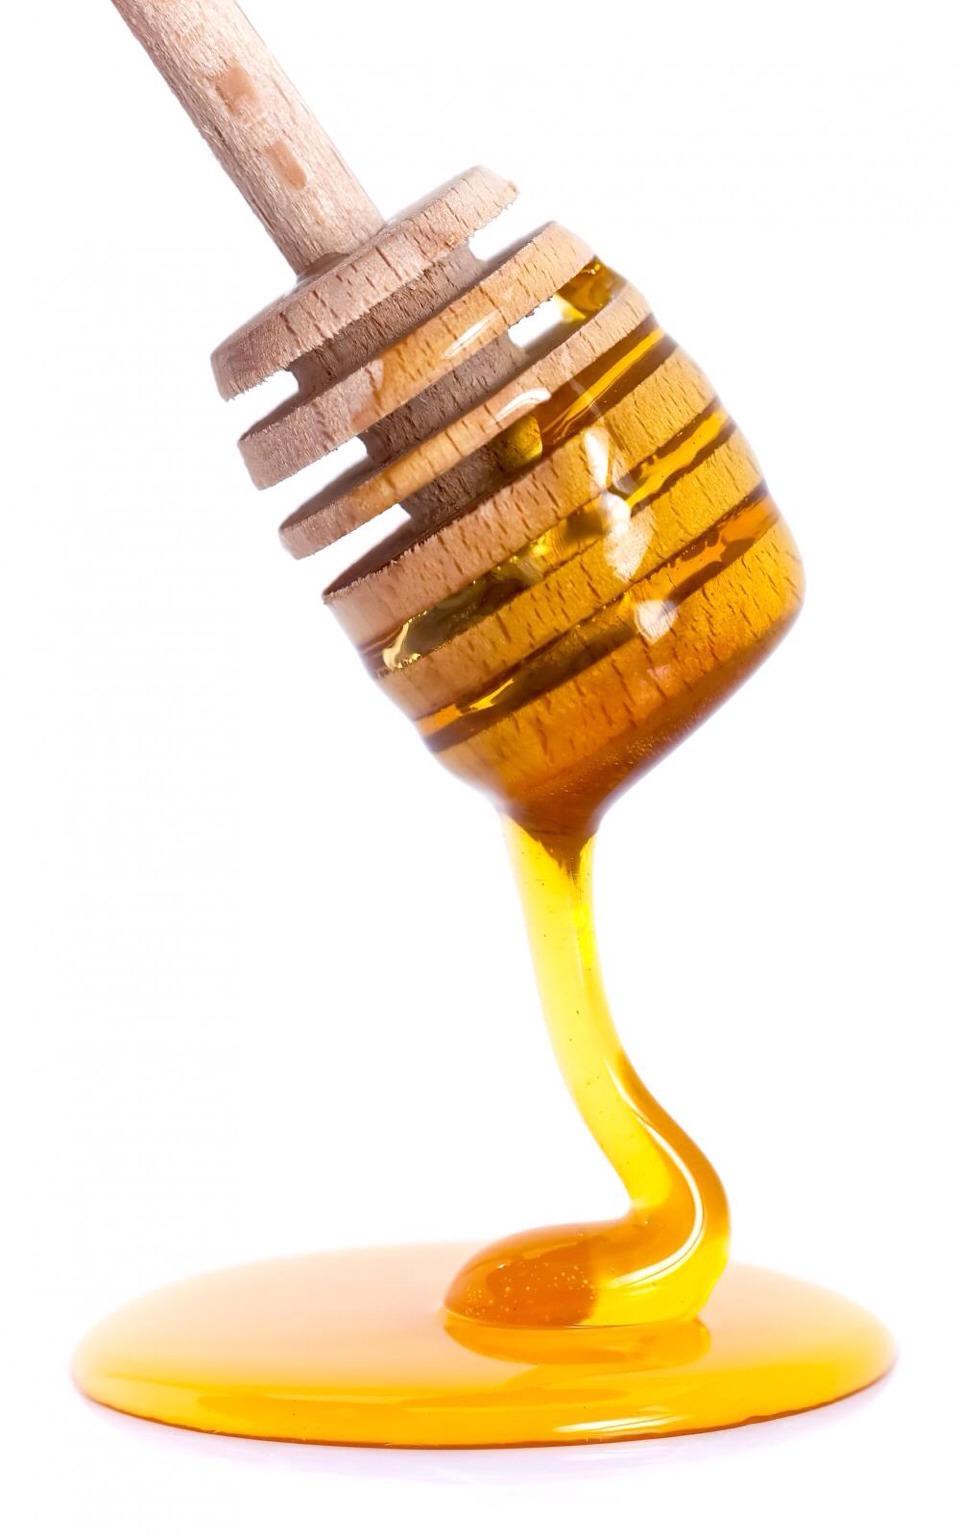 Honey to moisten pores